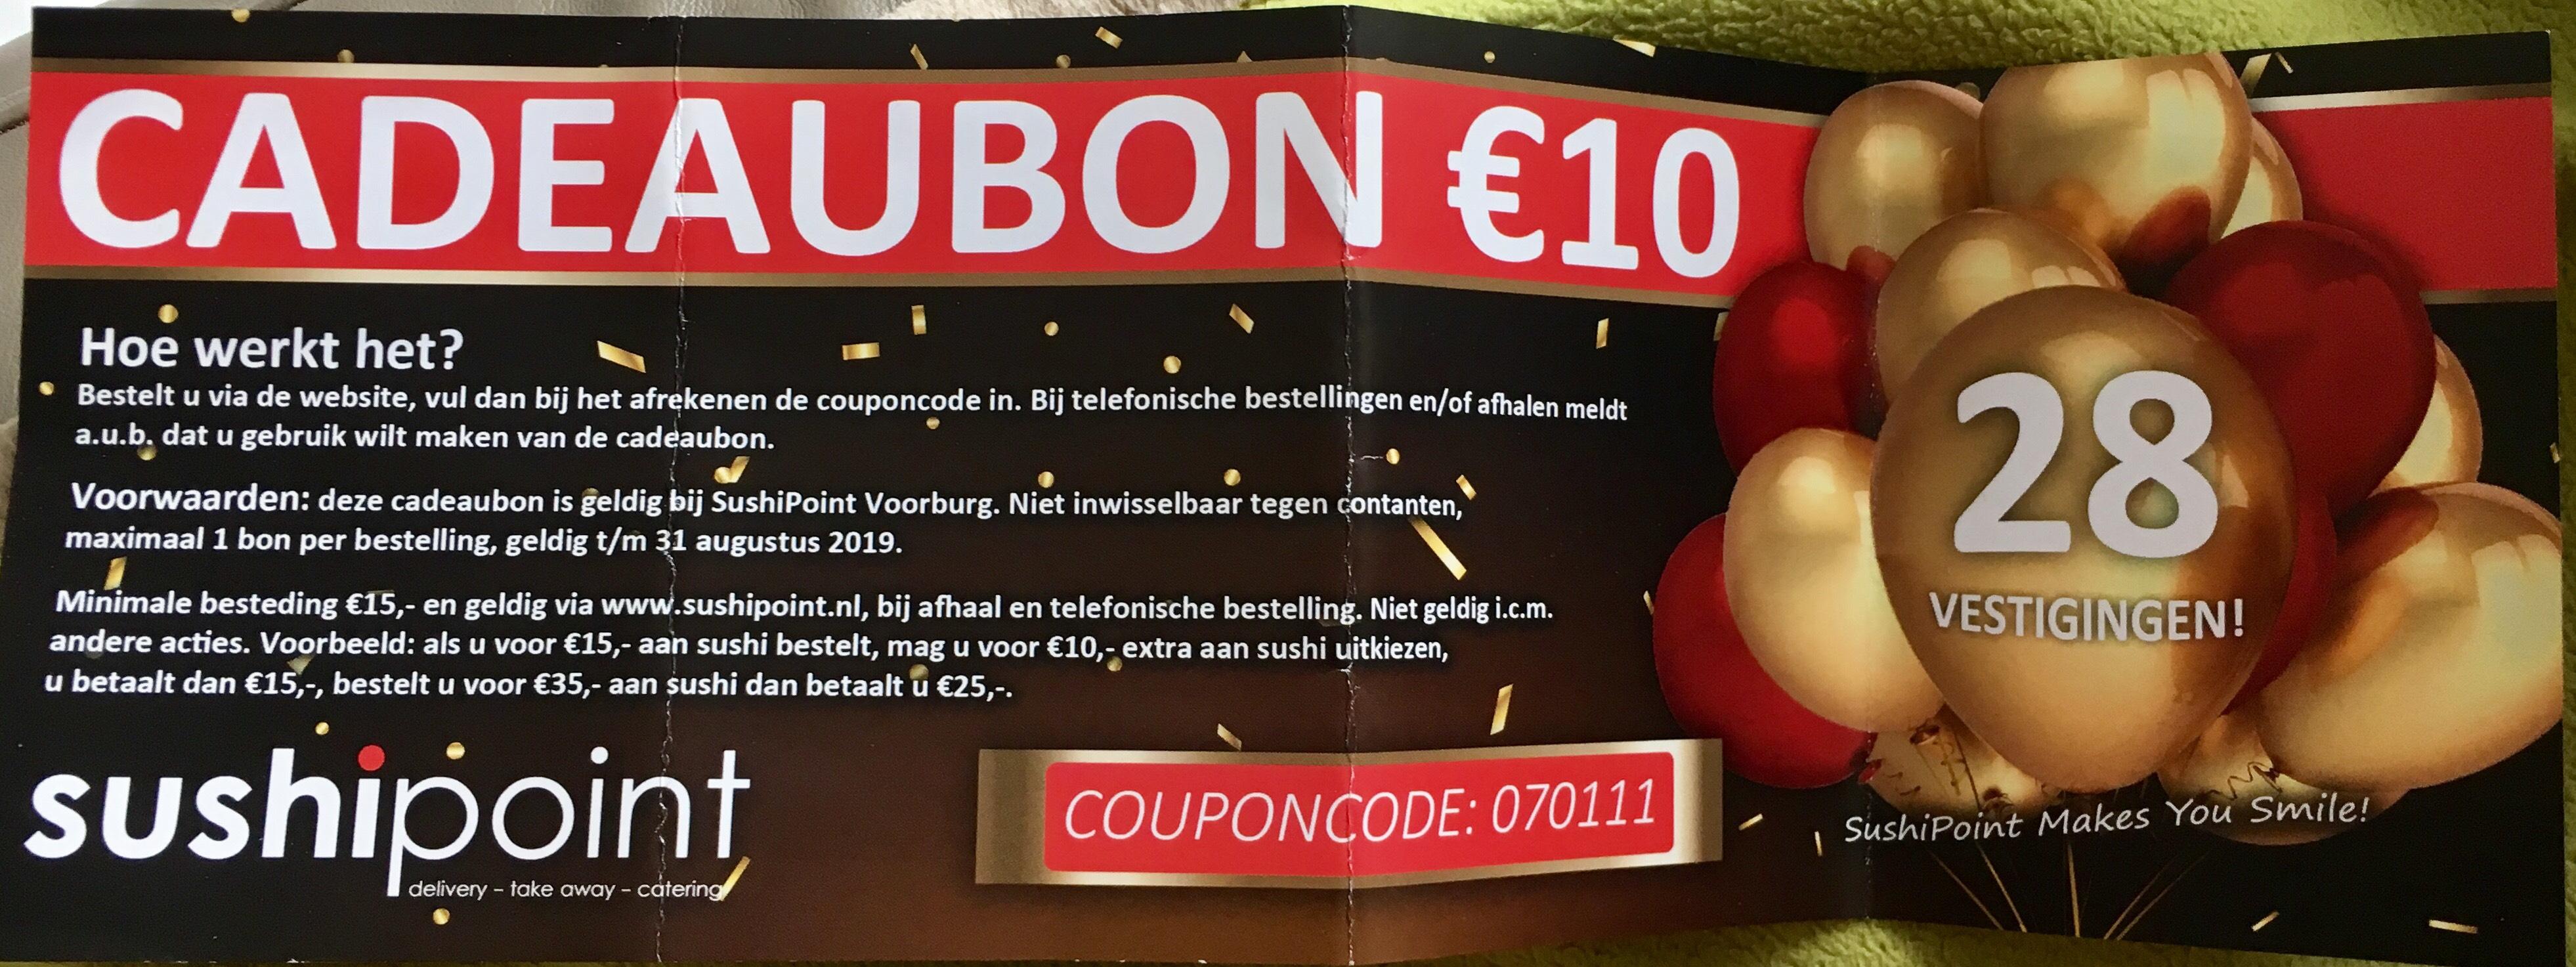 Sushipoint €10,- korting locatie Voorburg